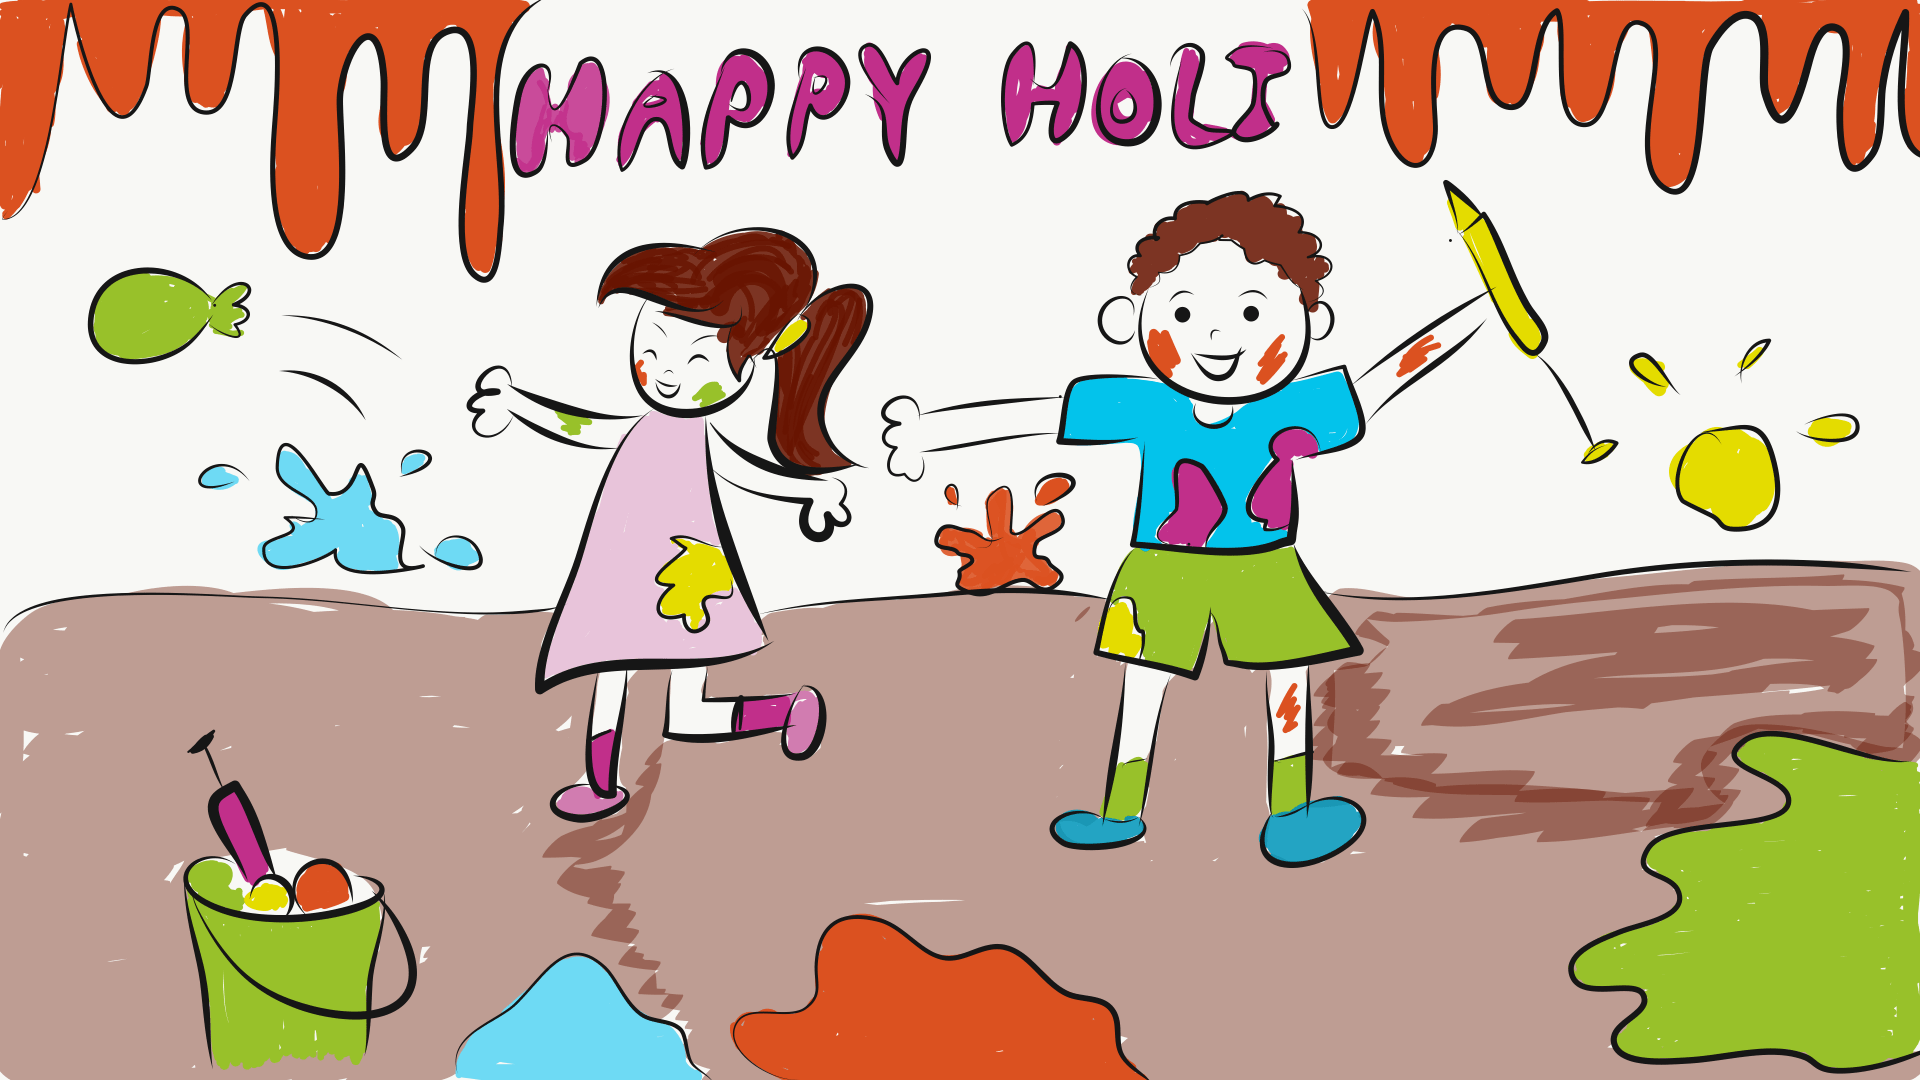 Happy Holi Kids Playing Holi Scene